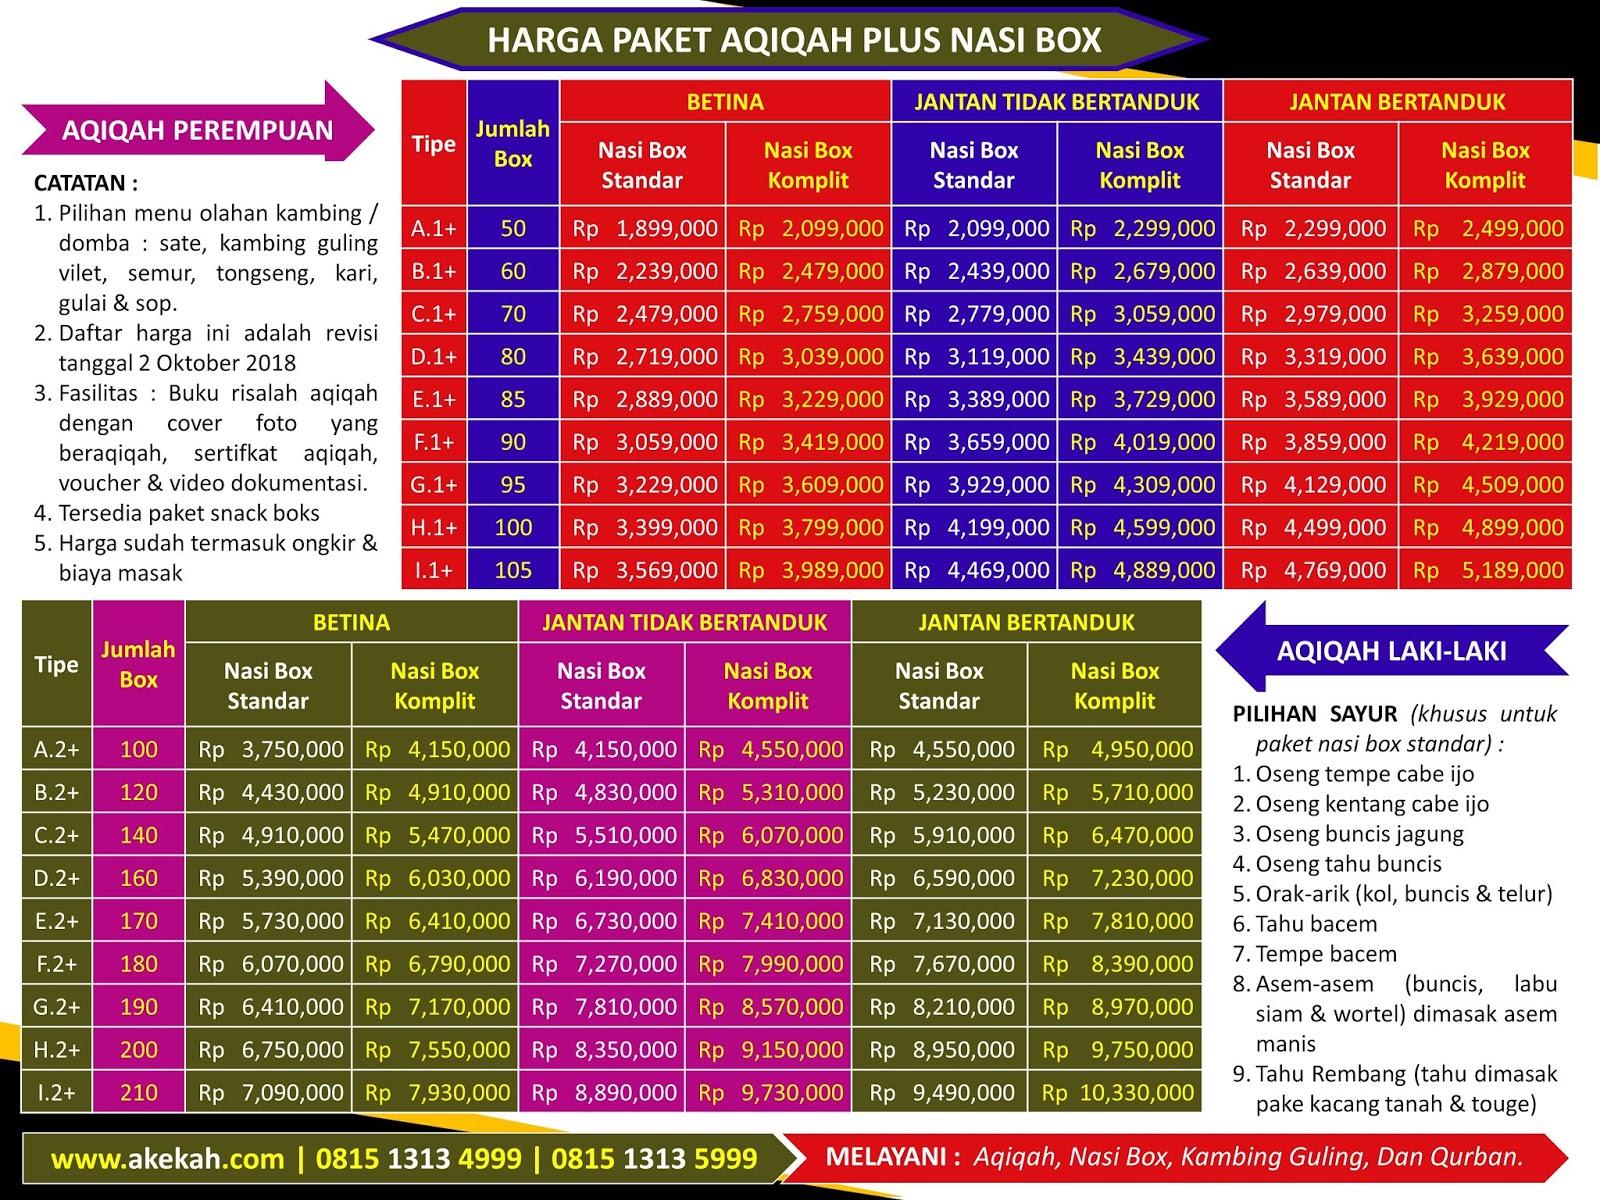 Penyedia Jasa Aqiqah & Catering Untuk Anak Perempuan Kecamatan Cariu Kabupaten Bogor Jawa Barat